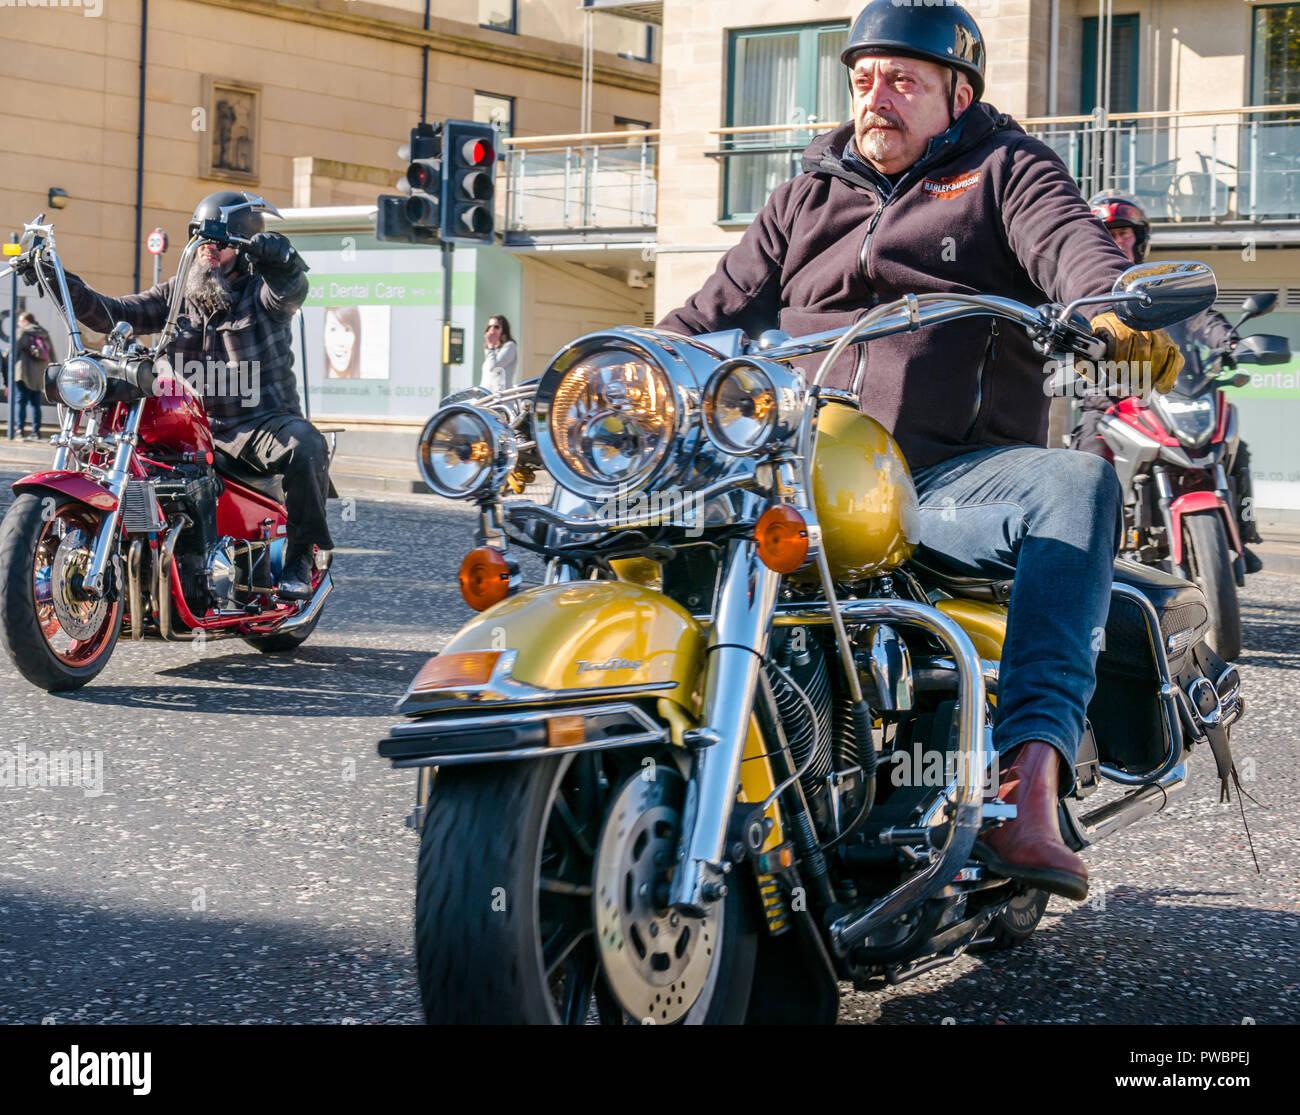 Scotland Voiture Moto Autocollant Sautoir Drapeau Glasgow Edinburgh Dundee Perth